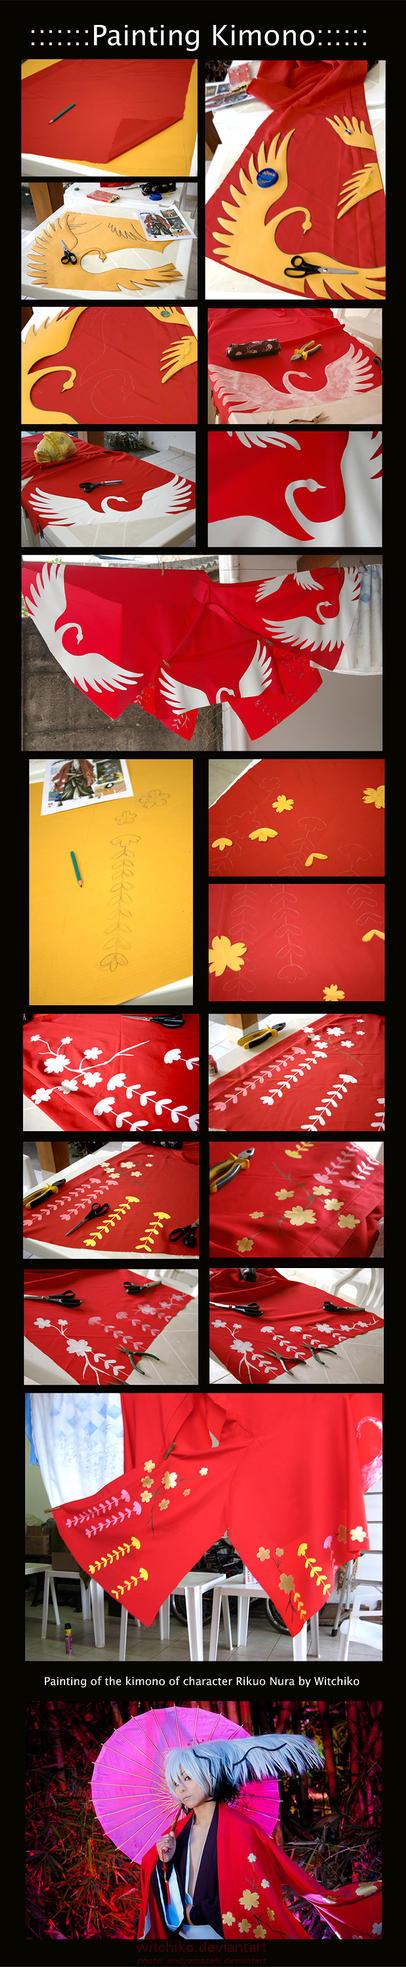 Painting the kimono:::::: by Witchiko